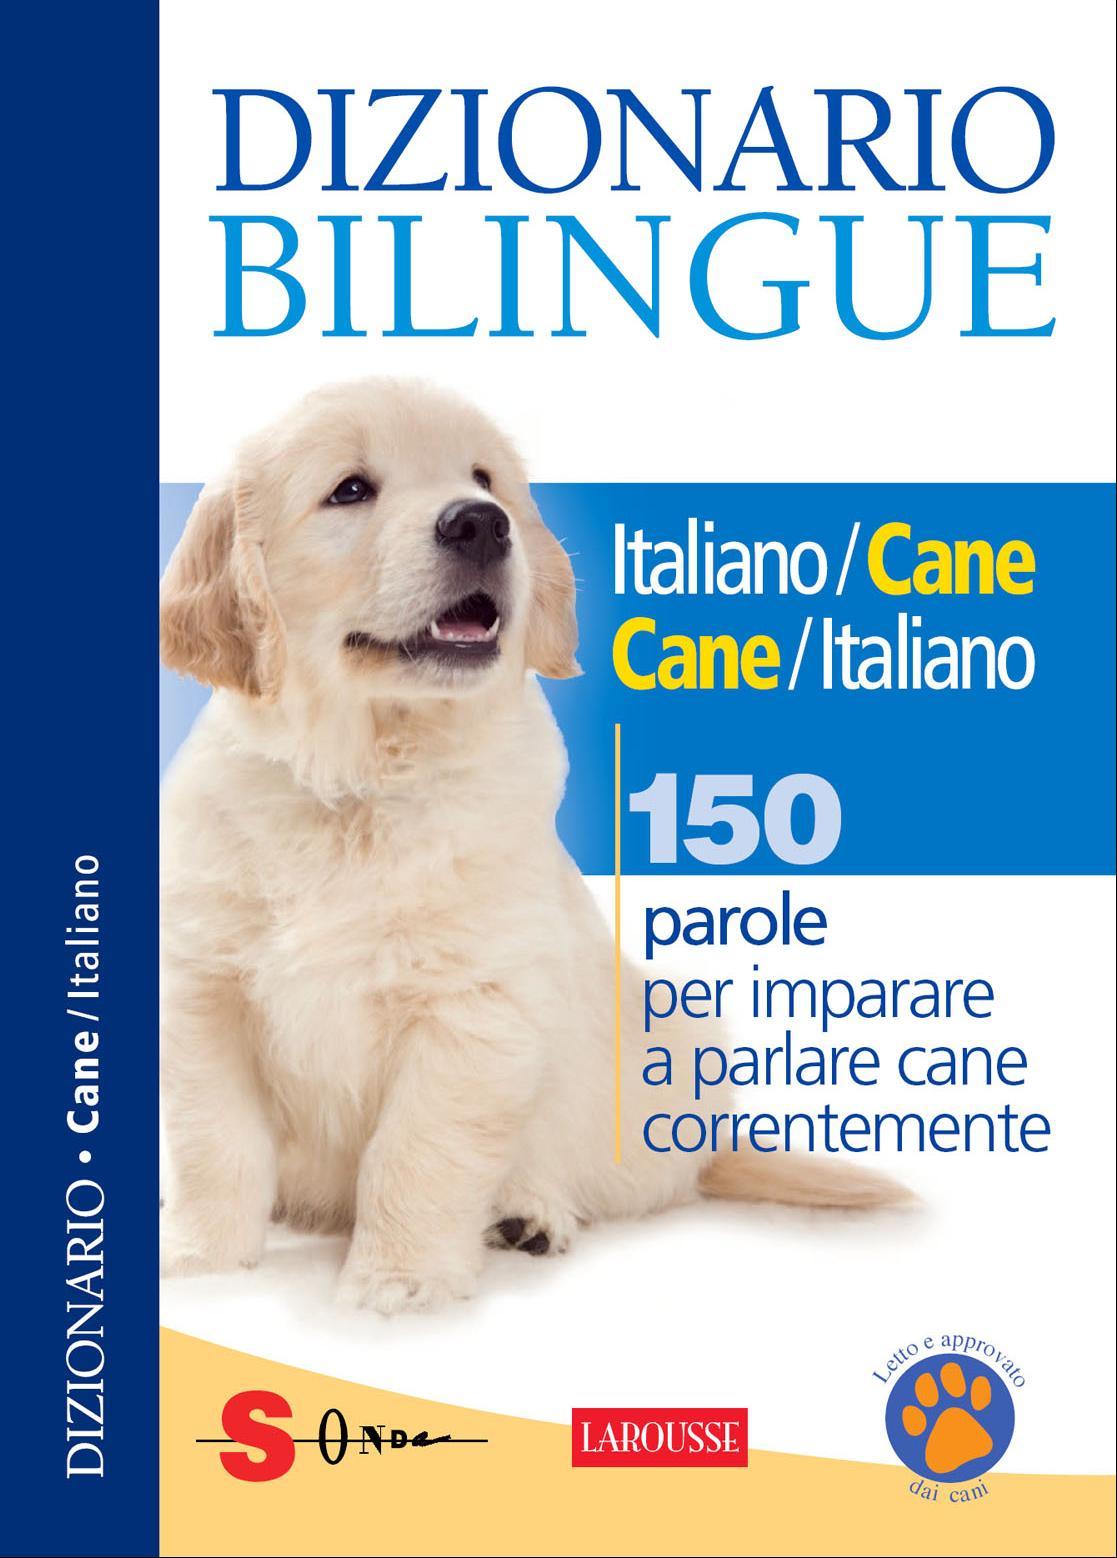 Dizionario bilingue ...